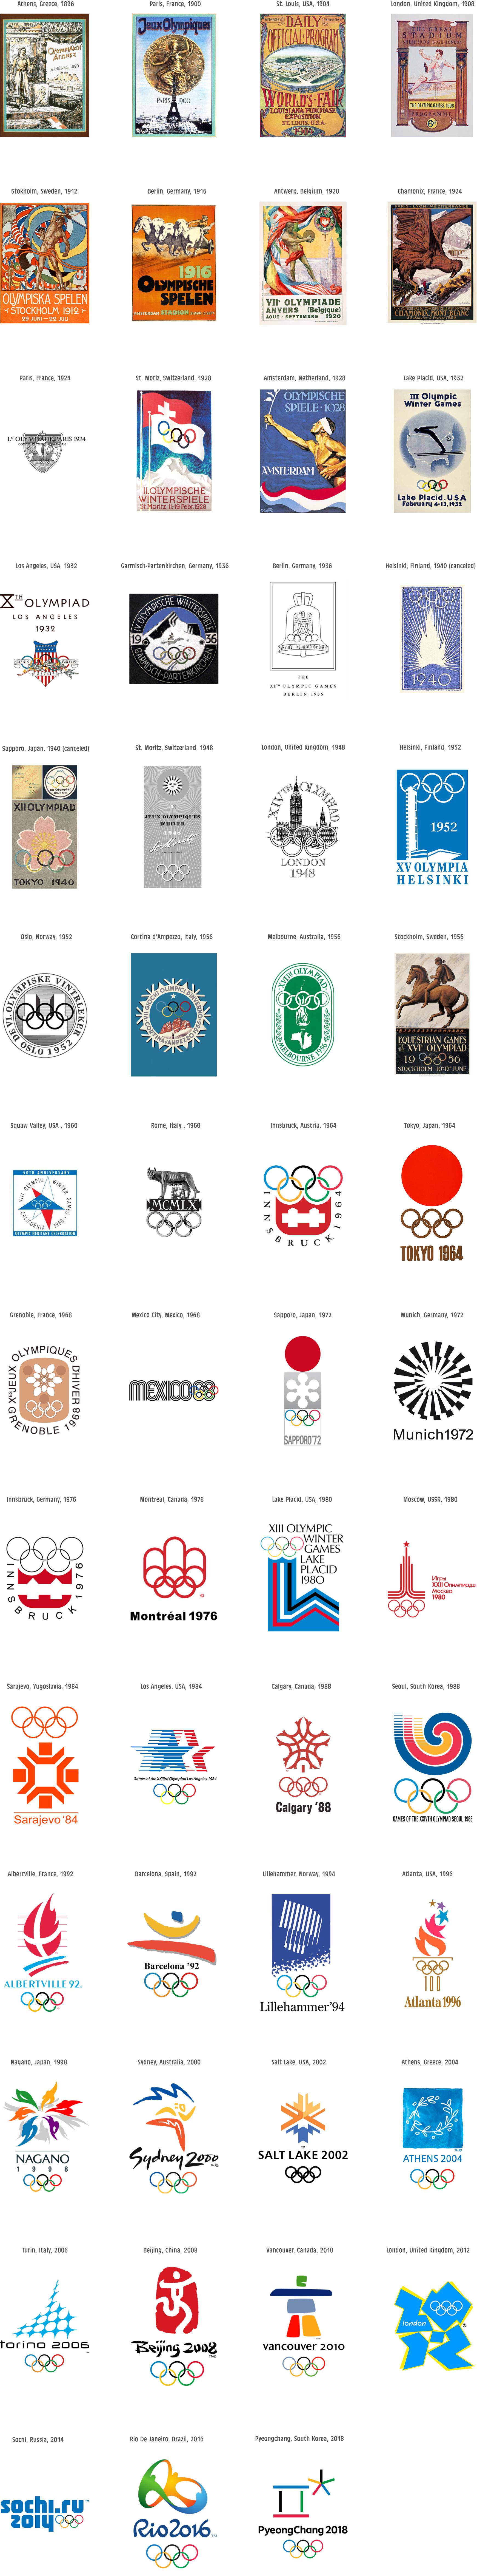 55 olympic games logo designs since 1896 logo design blog logobee 55 olympic games logos biocorpaavc Choice Image